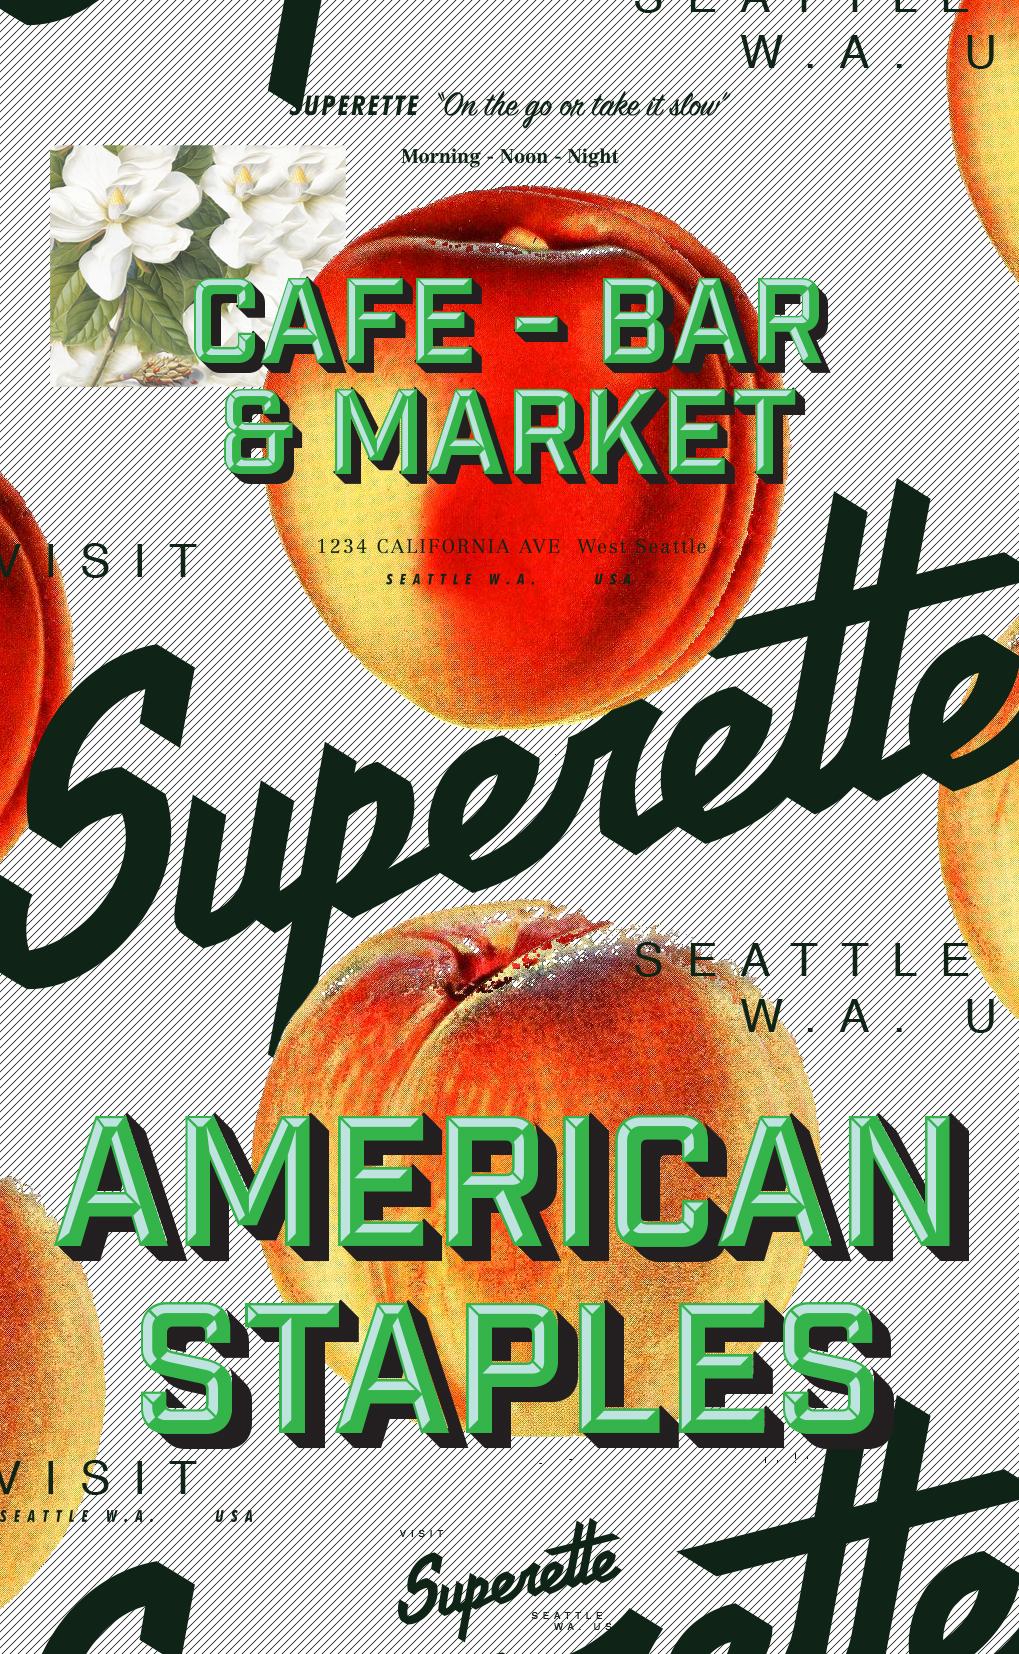 Supertte_Peaches_pattern_poster.jpg